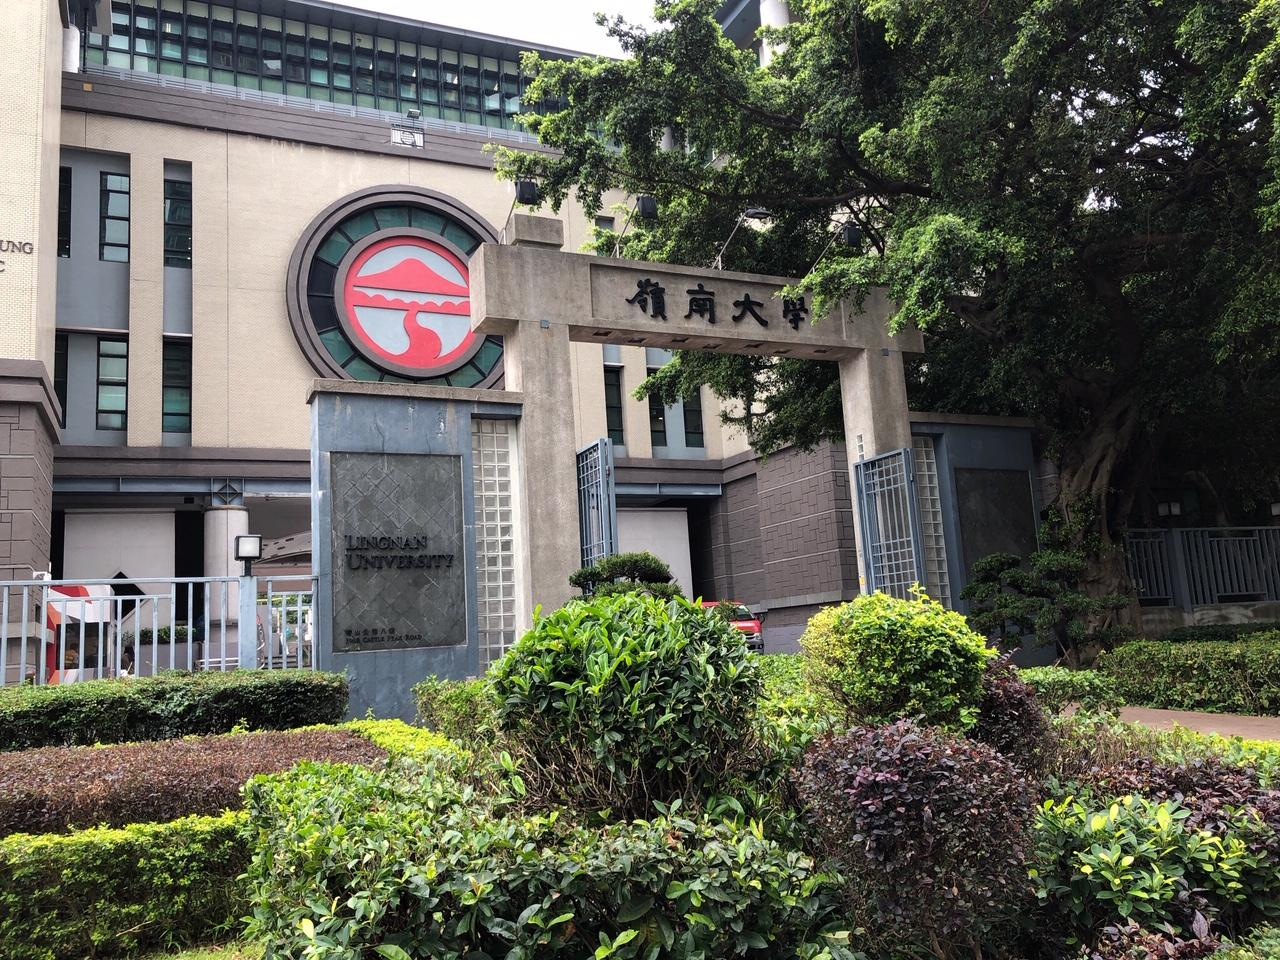 Lingnan University entrance arch